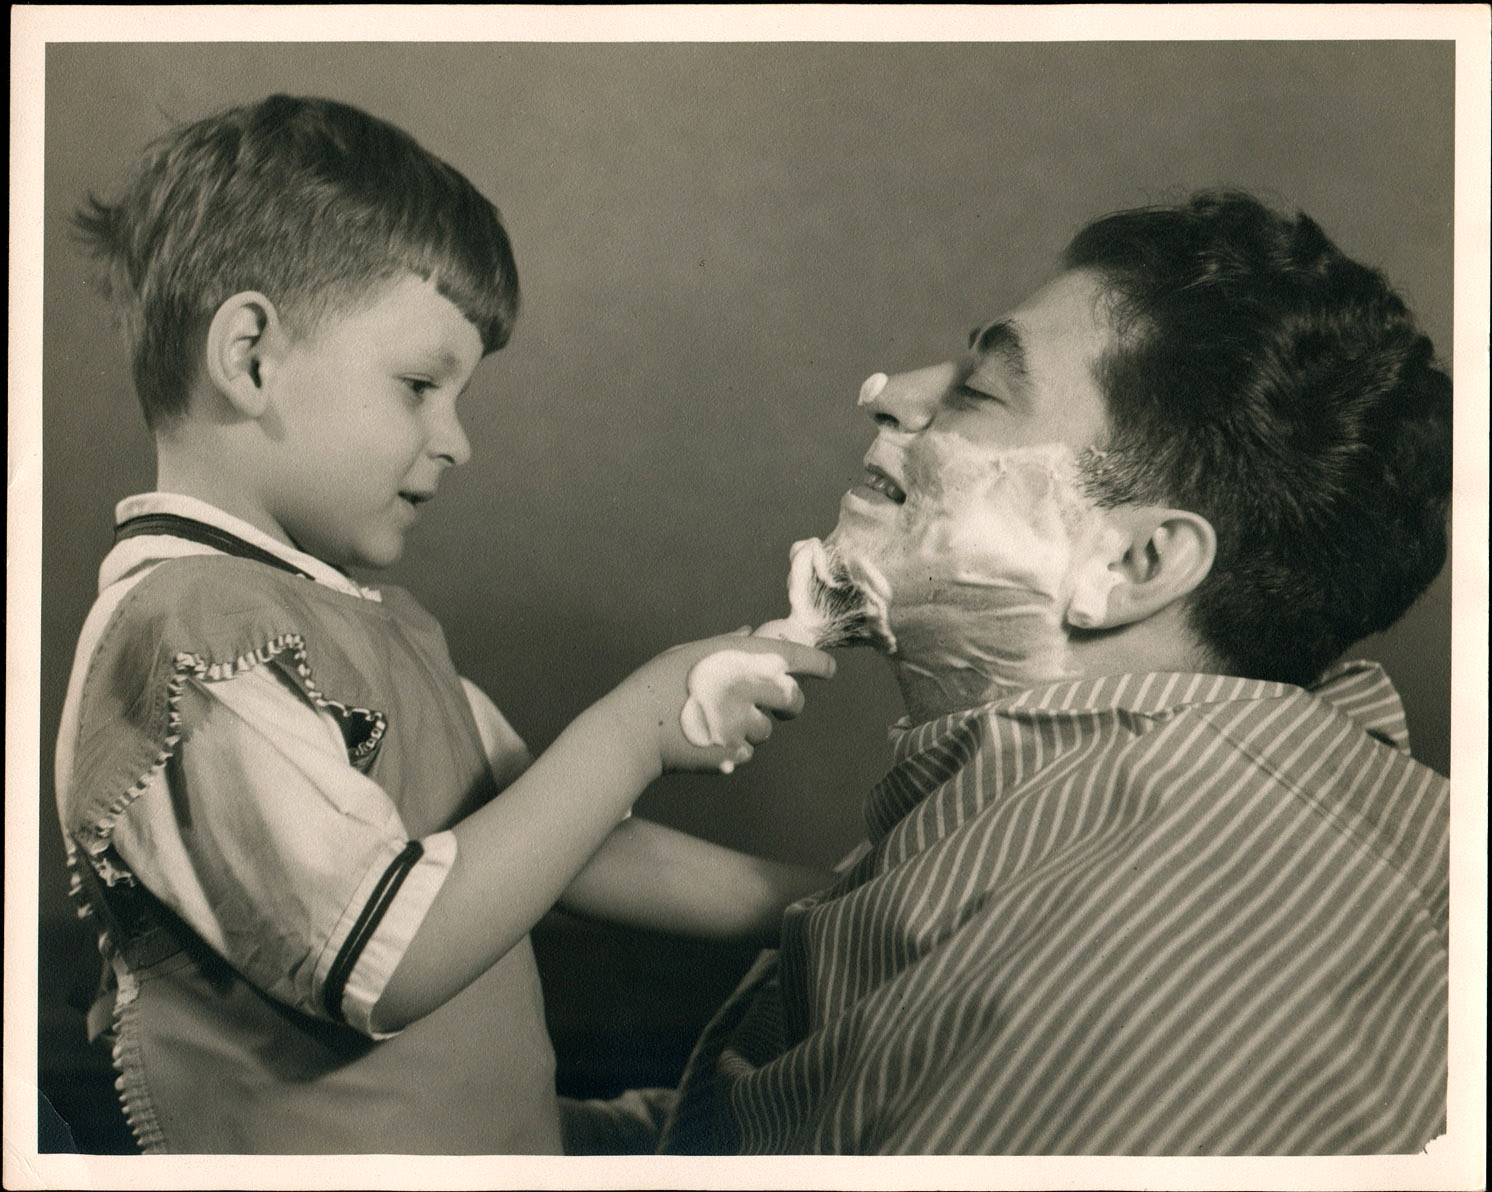 Don & Grampop.jpg